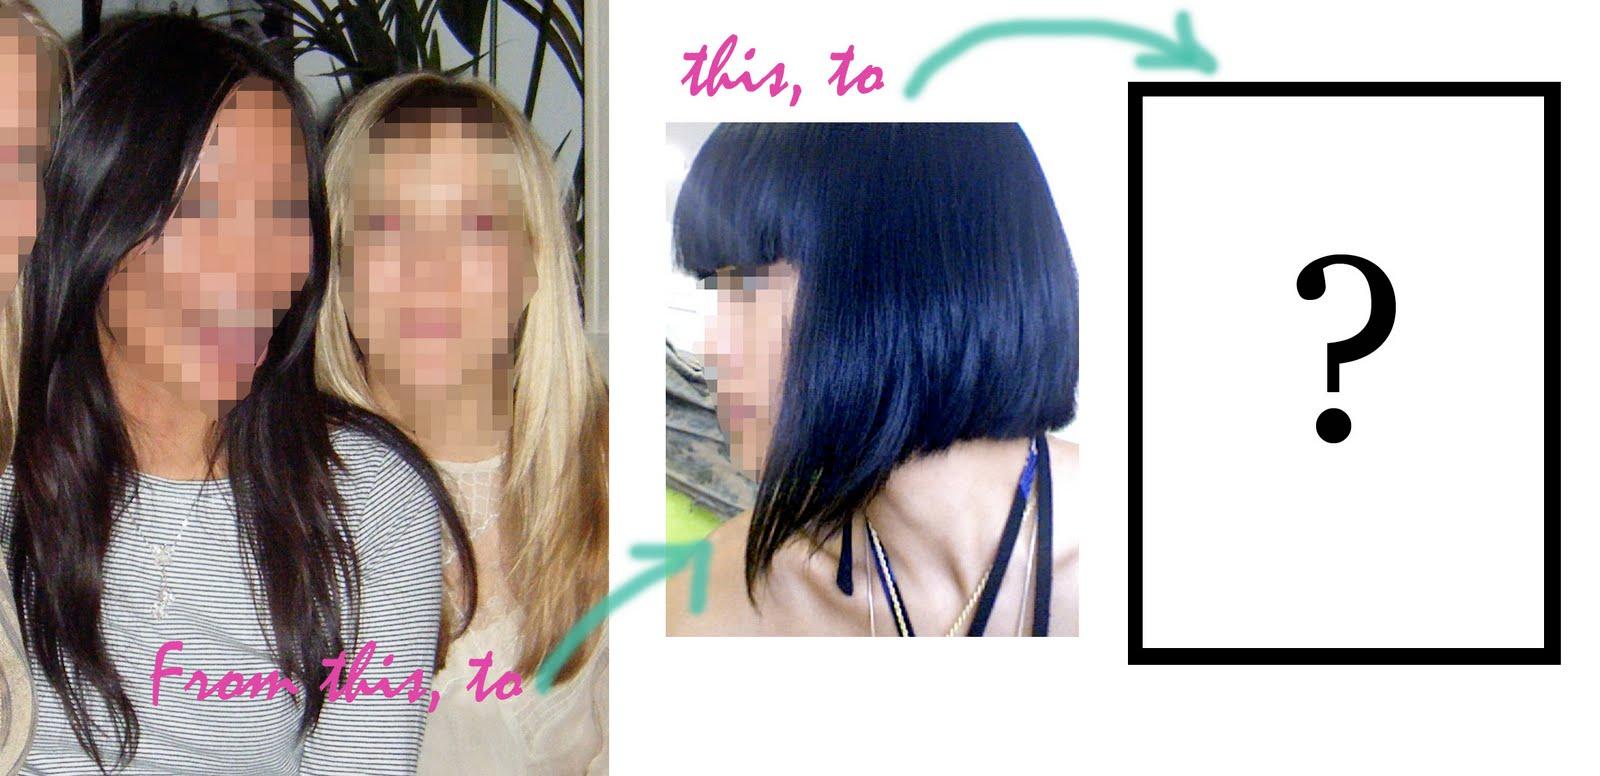 http://4.bp.blogspot.com/_EoB-OBYX850/S-w2UE3puwI/AAAAAAAABAw/-14DvBqz5hk/s1600/Hair+decisions.jpg